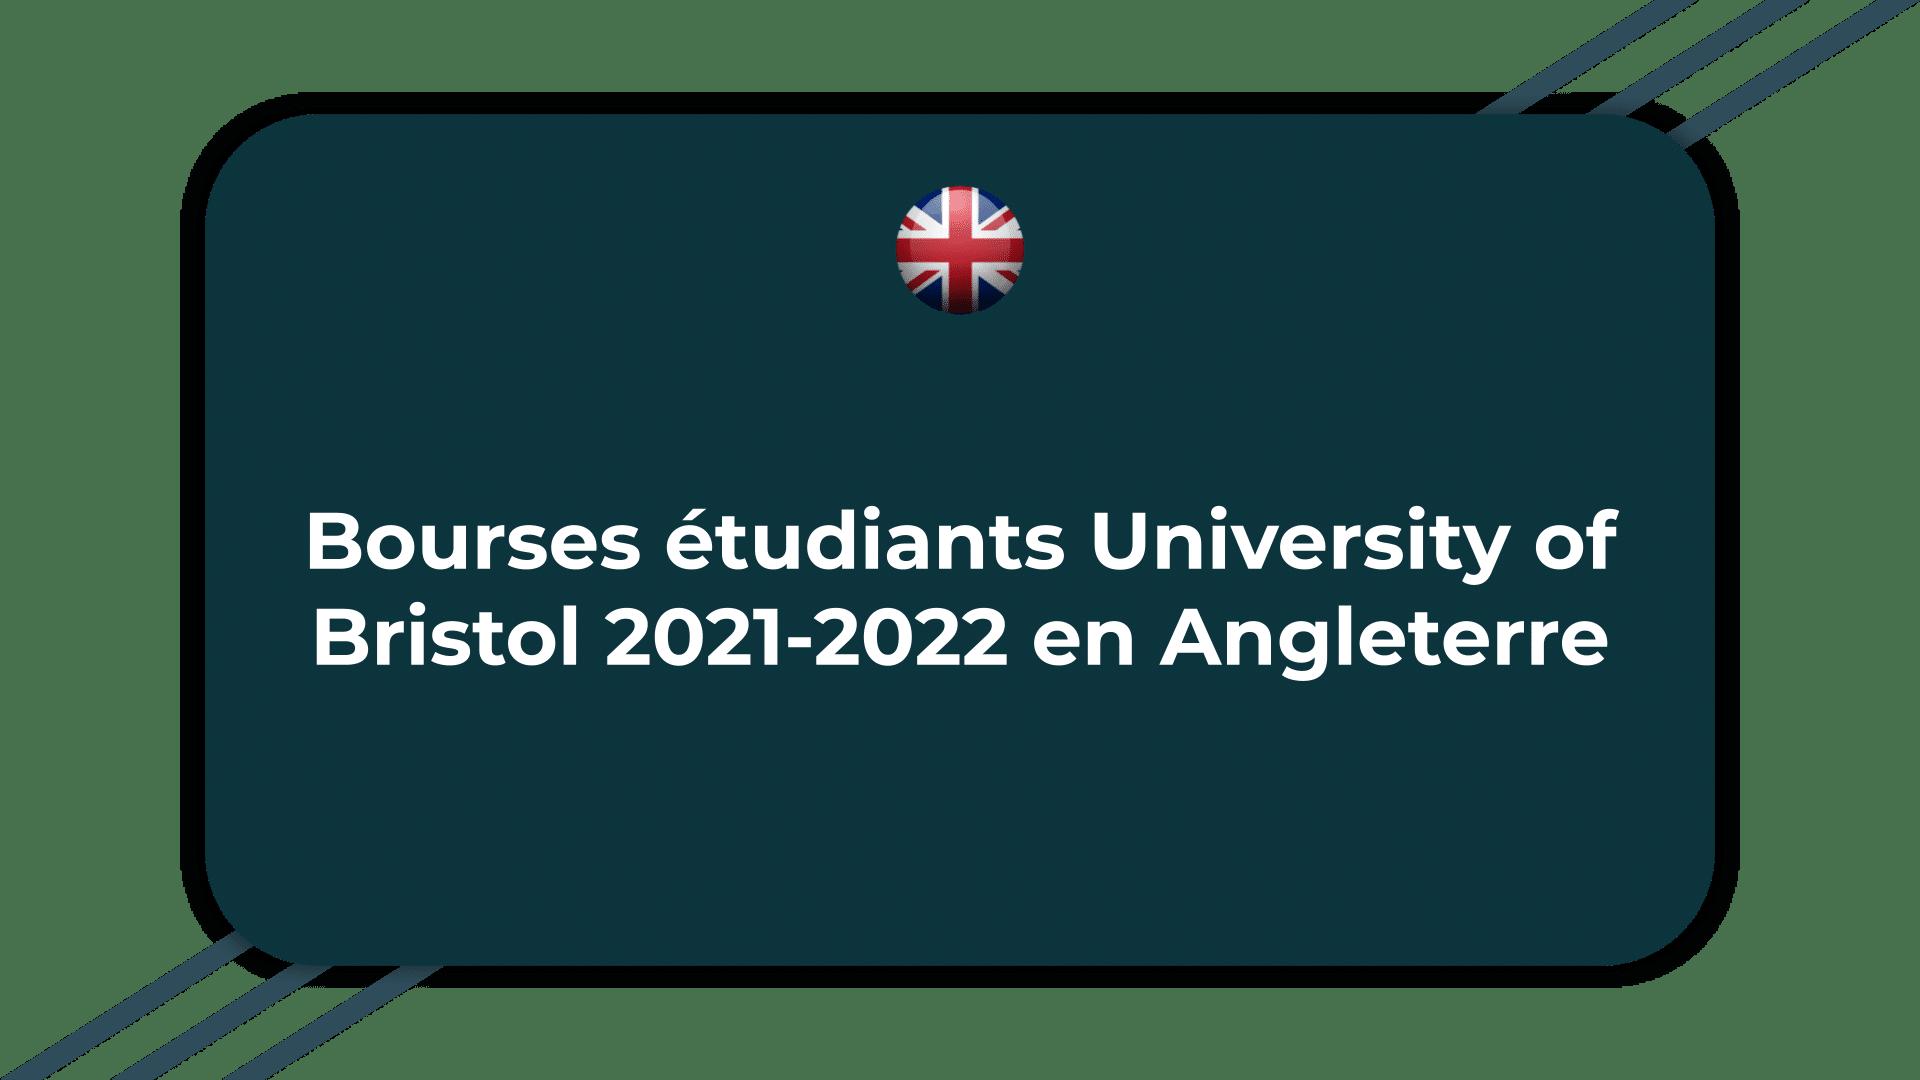 Bourses étudiants University of Bristol